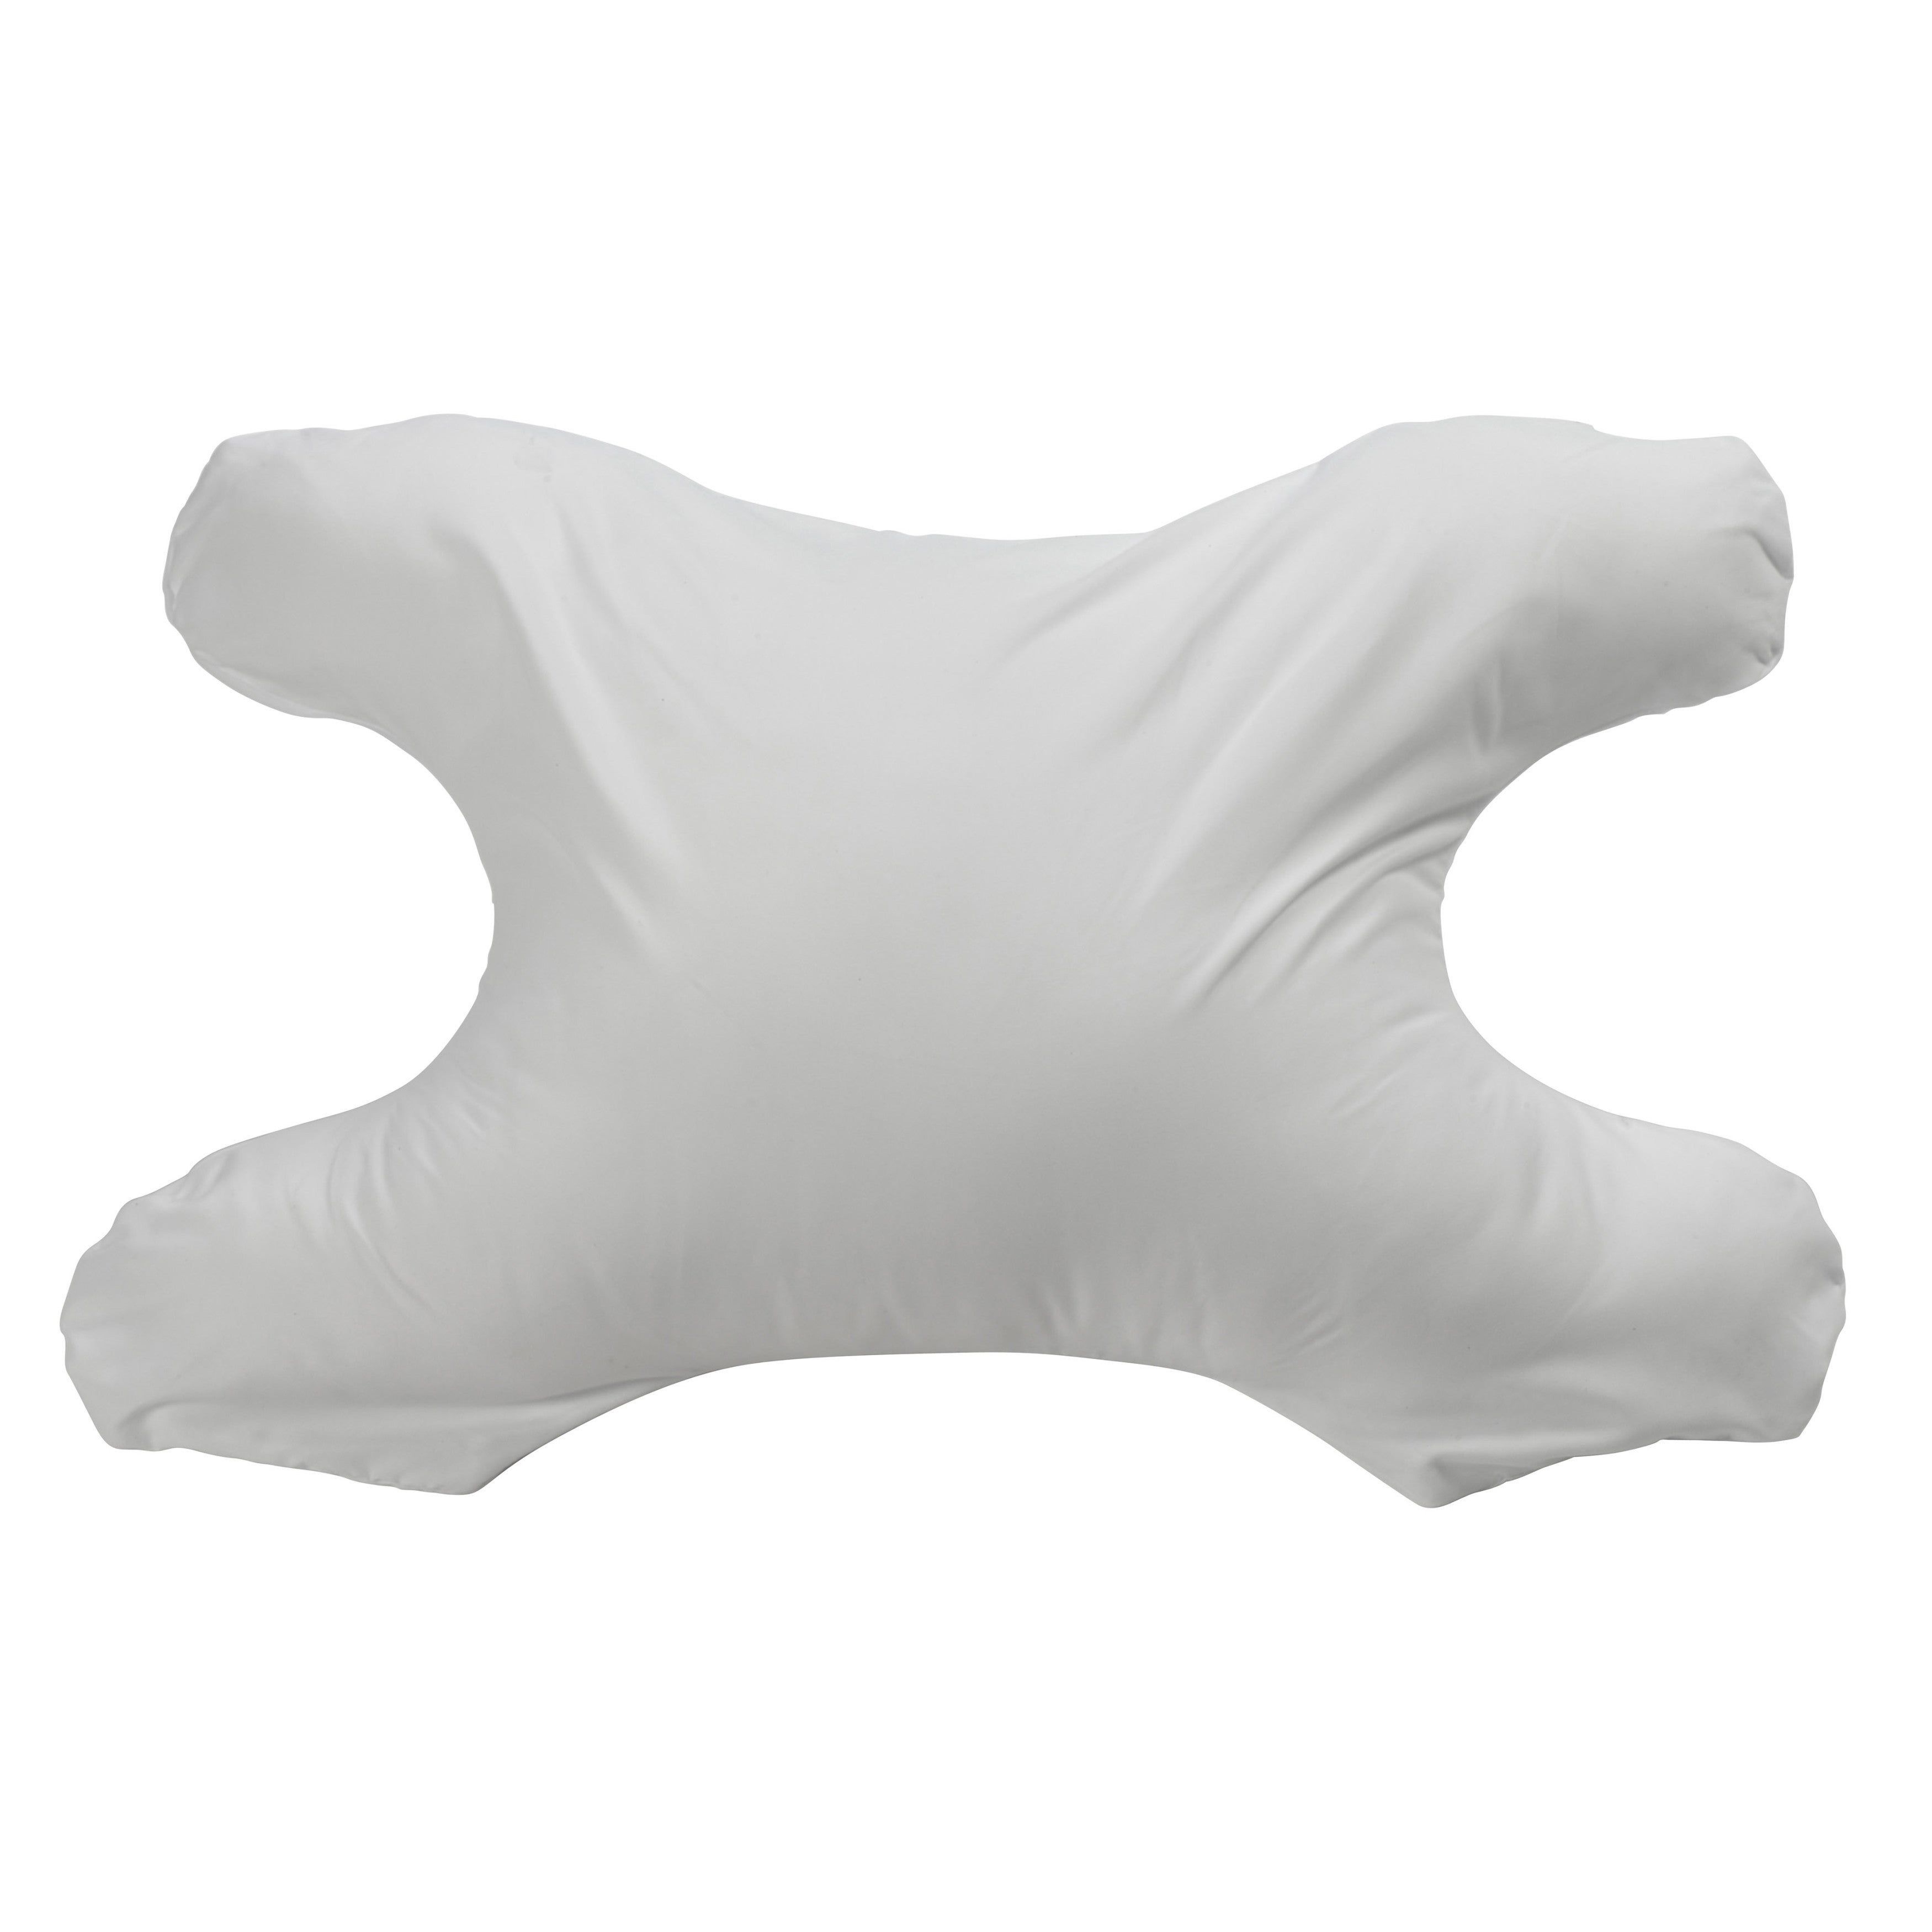 Drive Medical IntelliPAP Polyester Sleep Aid Pillowcase f...